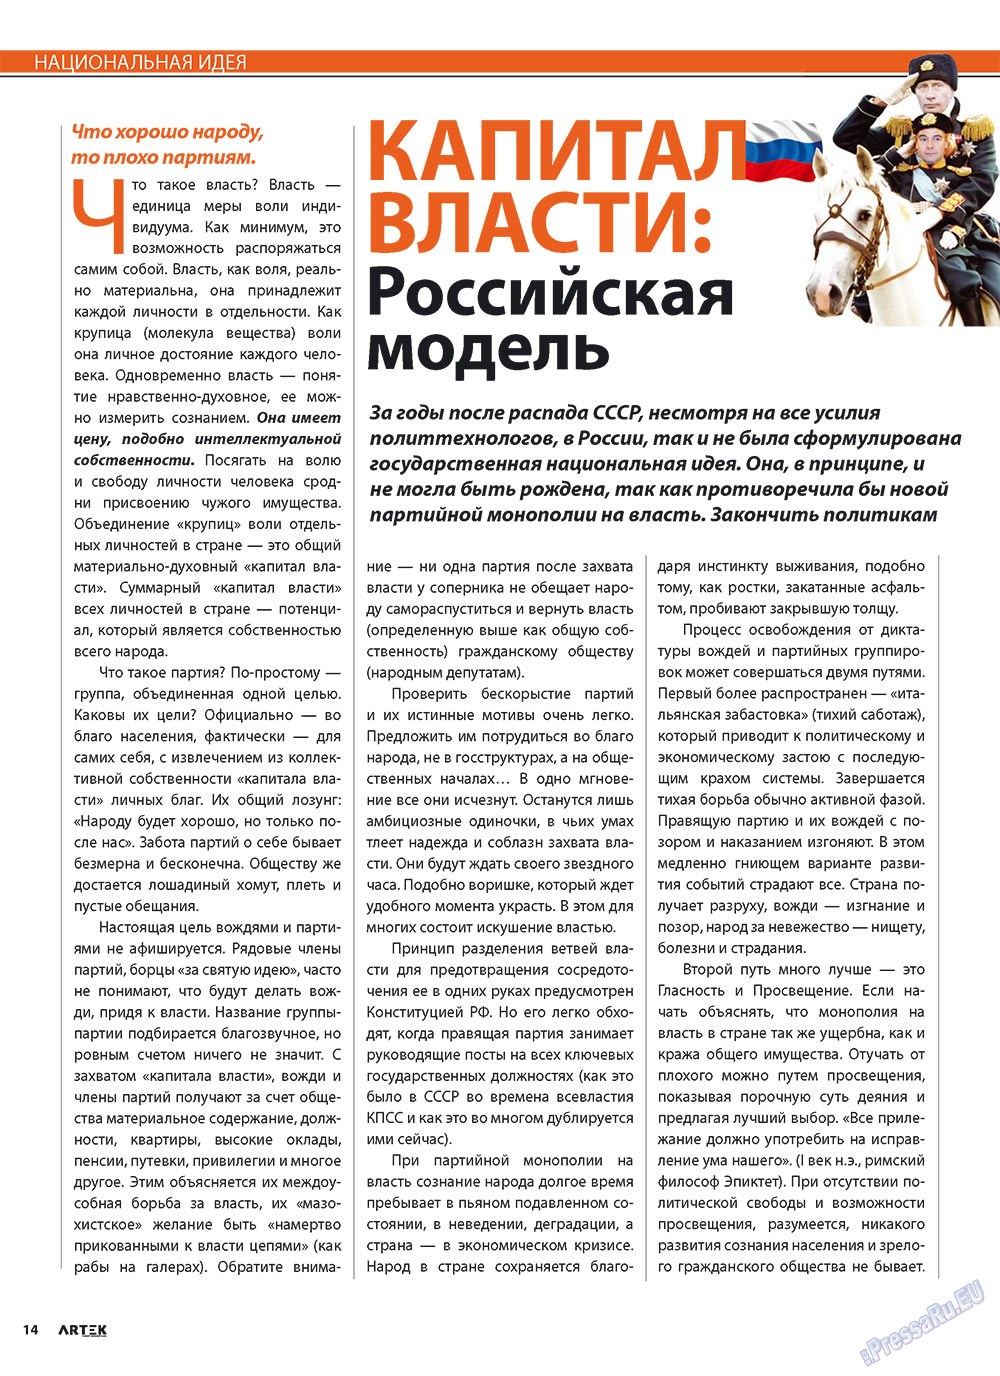 Артек (журнал). 2010 год, номер 2, стр. 16